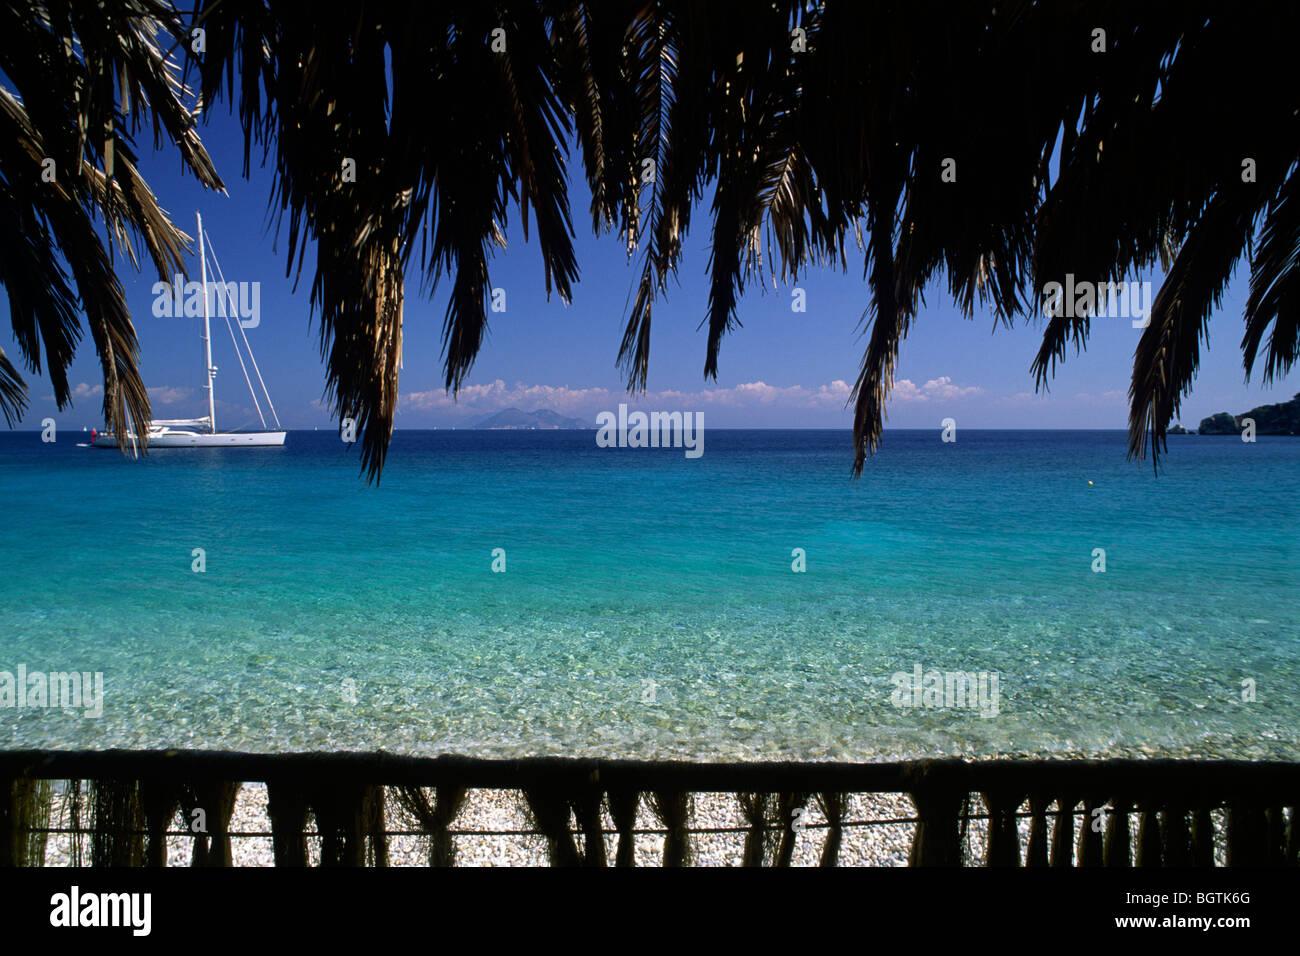 greece, ionian islands, ithaca, gidaki beach, seaside cafe - Stock Image